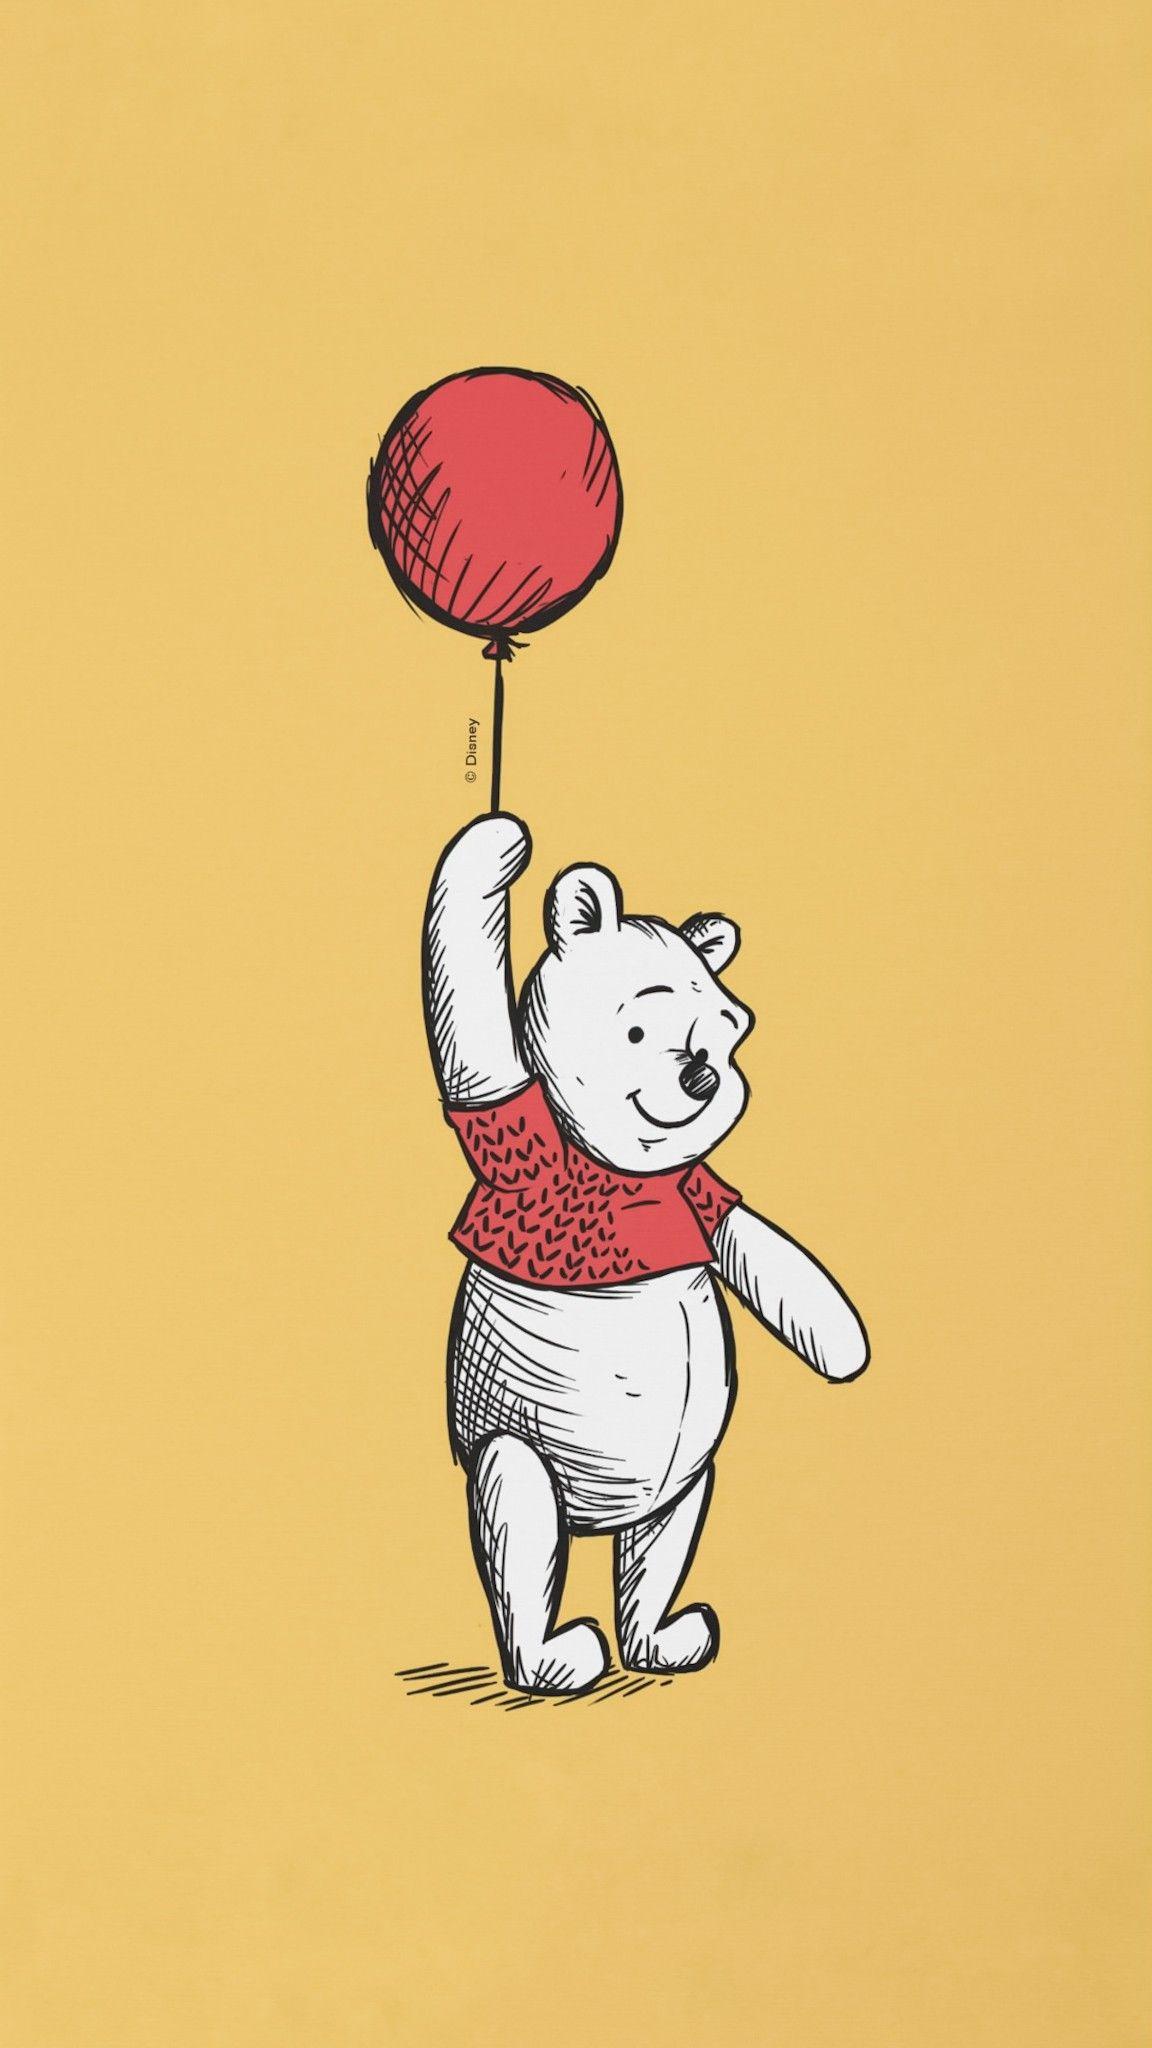 Pin By Sejla Hadzic On Winnie The Pooh Bg In 2020 Cute Disney Wallpaper Winnie The Pooh Background Cartoon Wallpaper